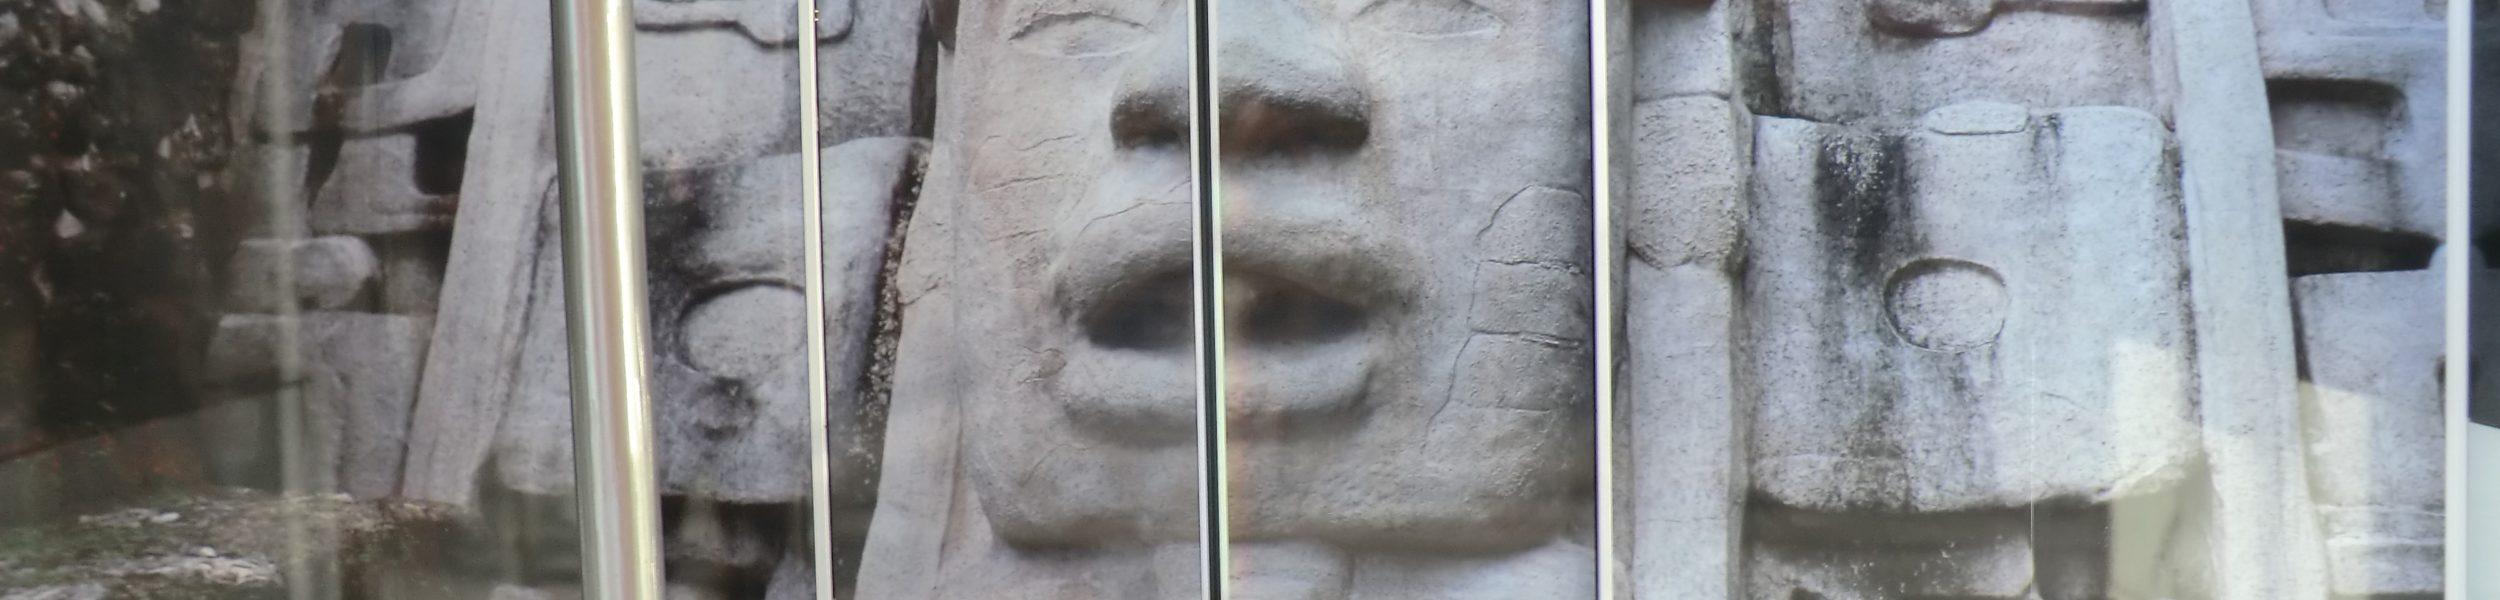 mayatuer 002